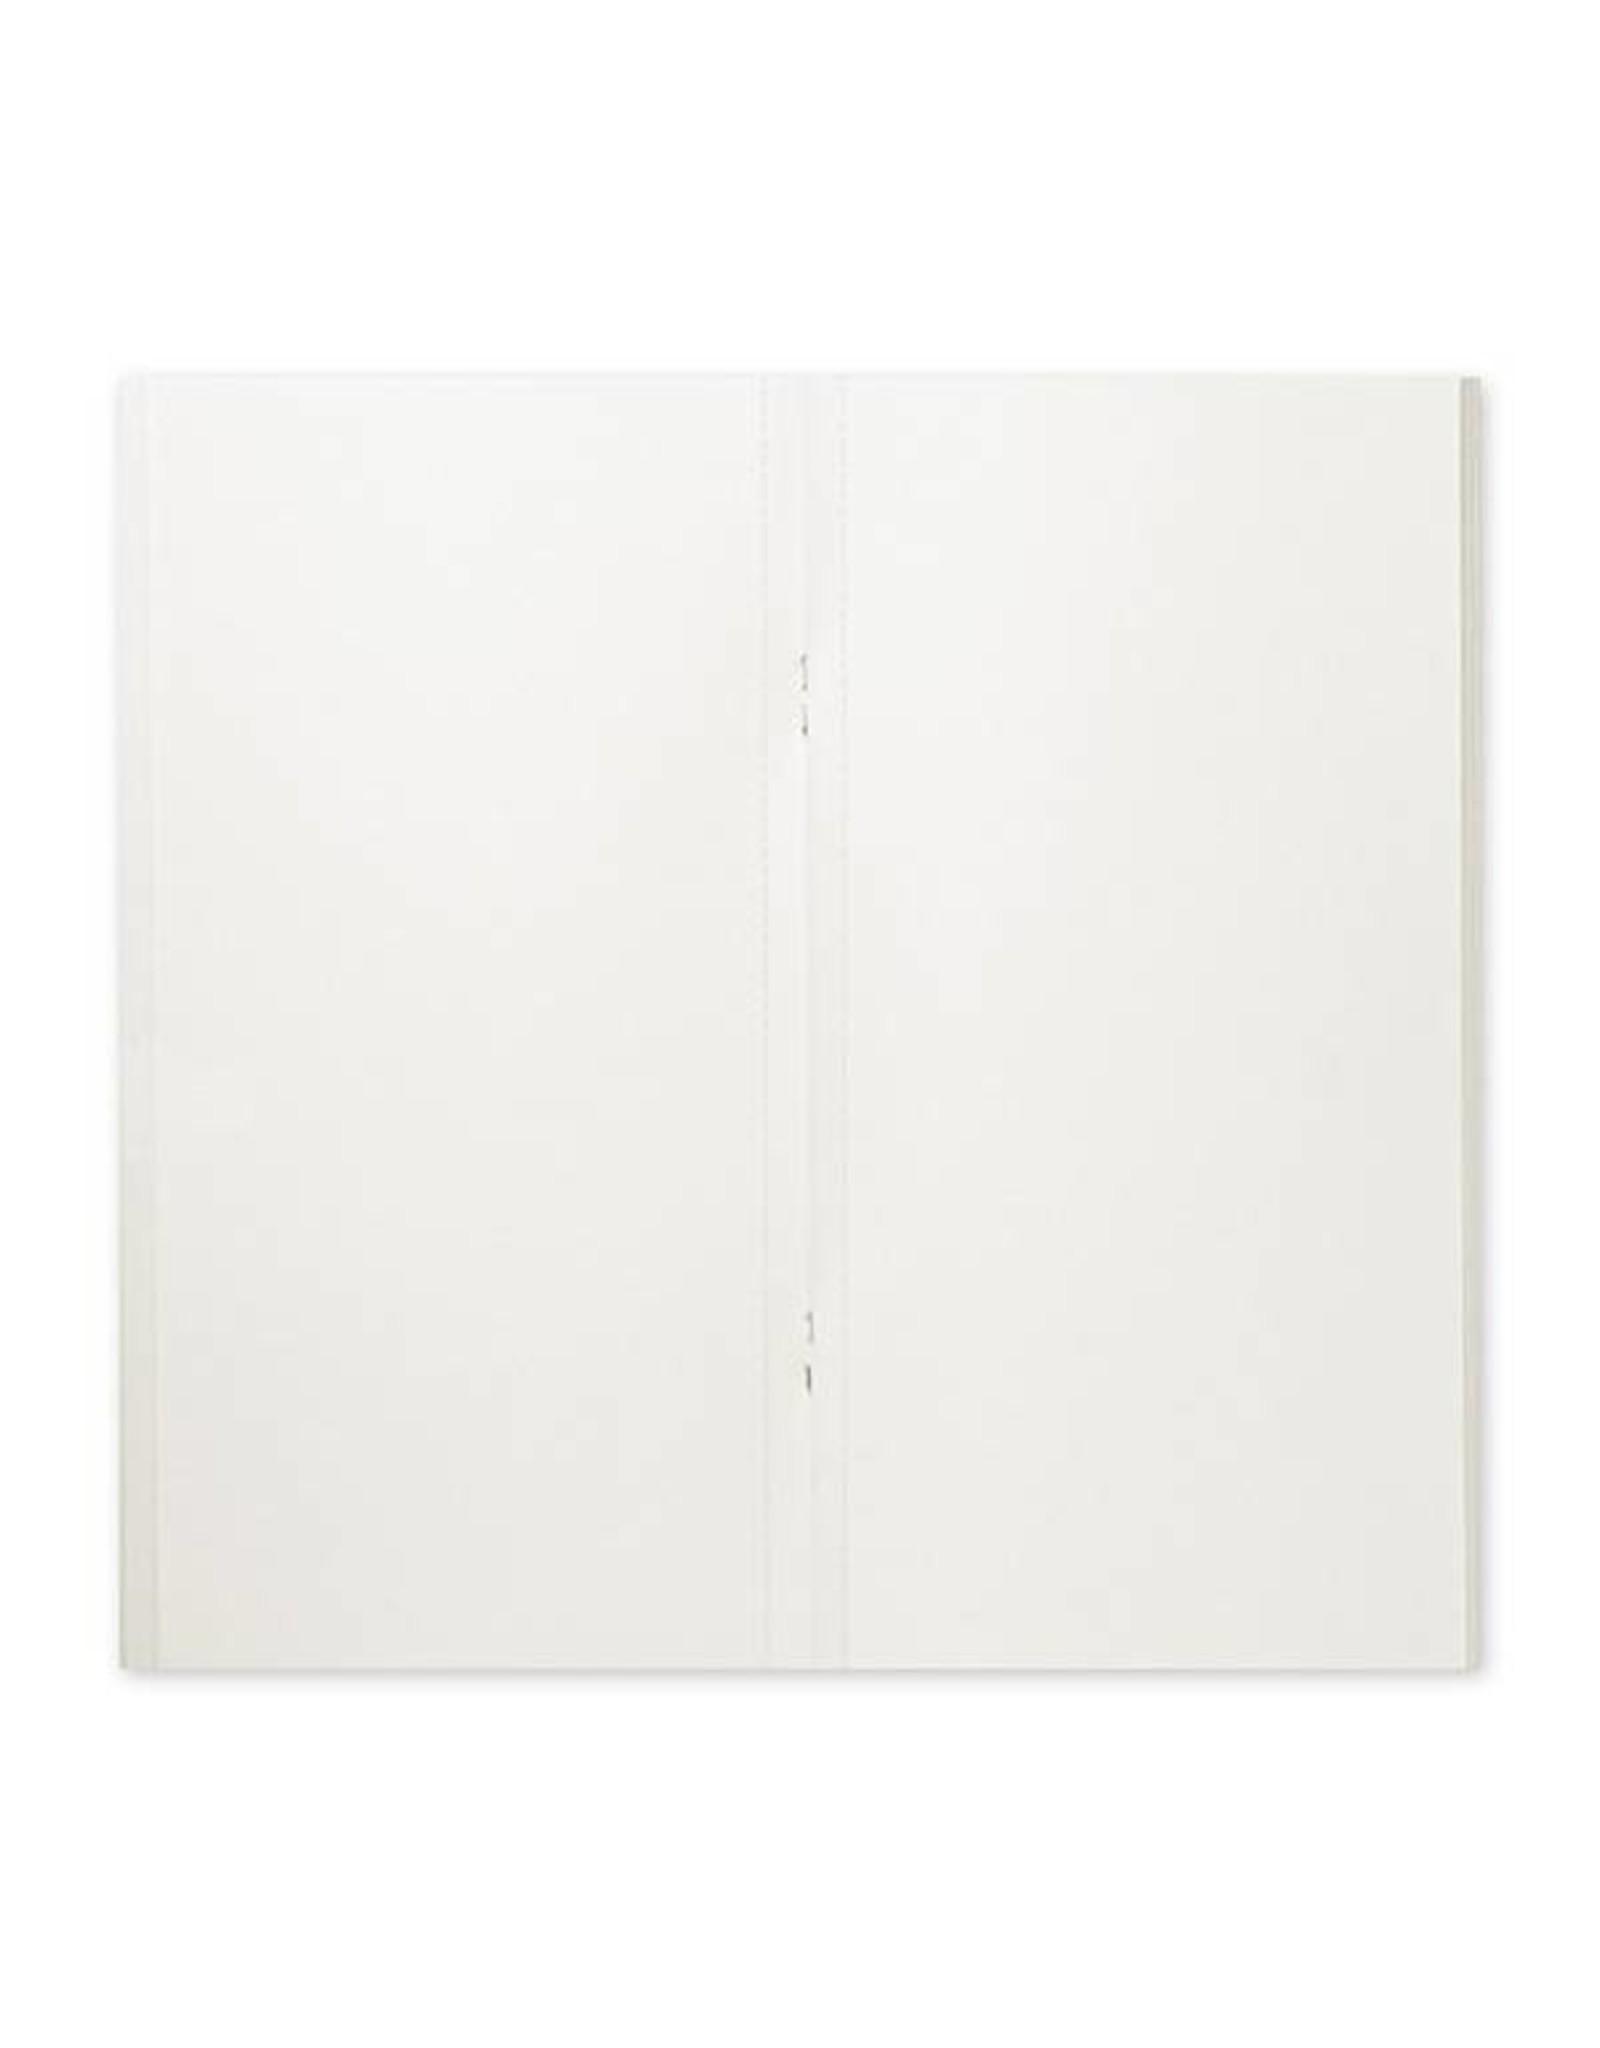 Traveler's Company 012. SKETCHING PAPER (48 PG) MIDORI TRAVELER'S NOTEBOOK